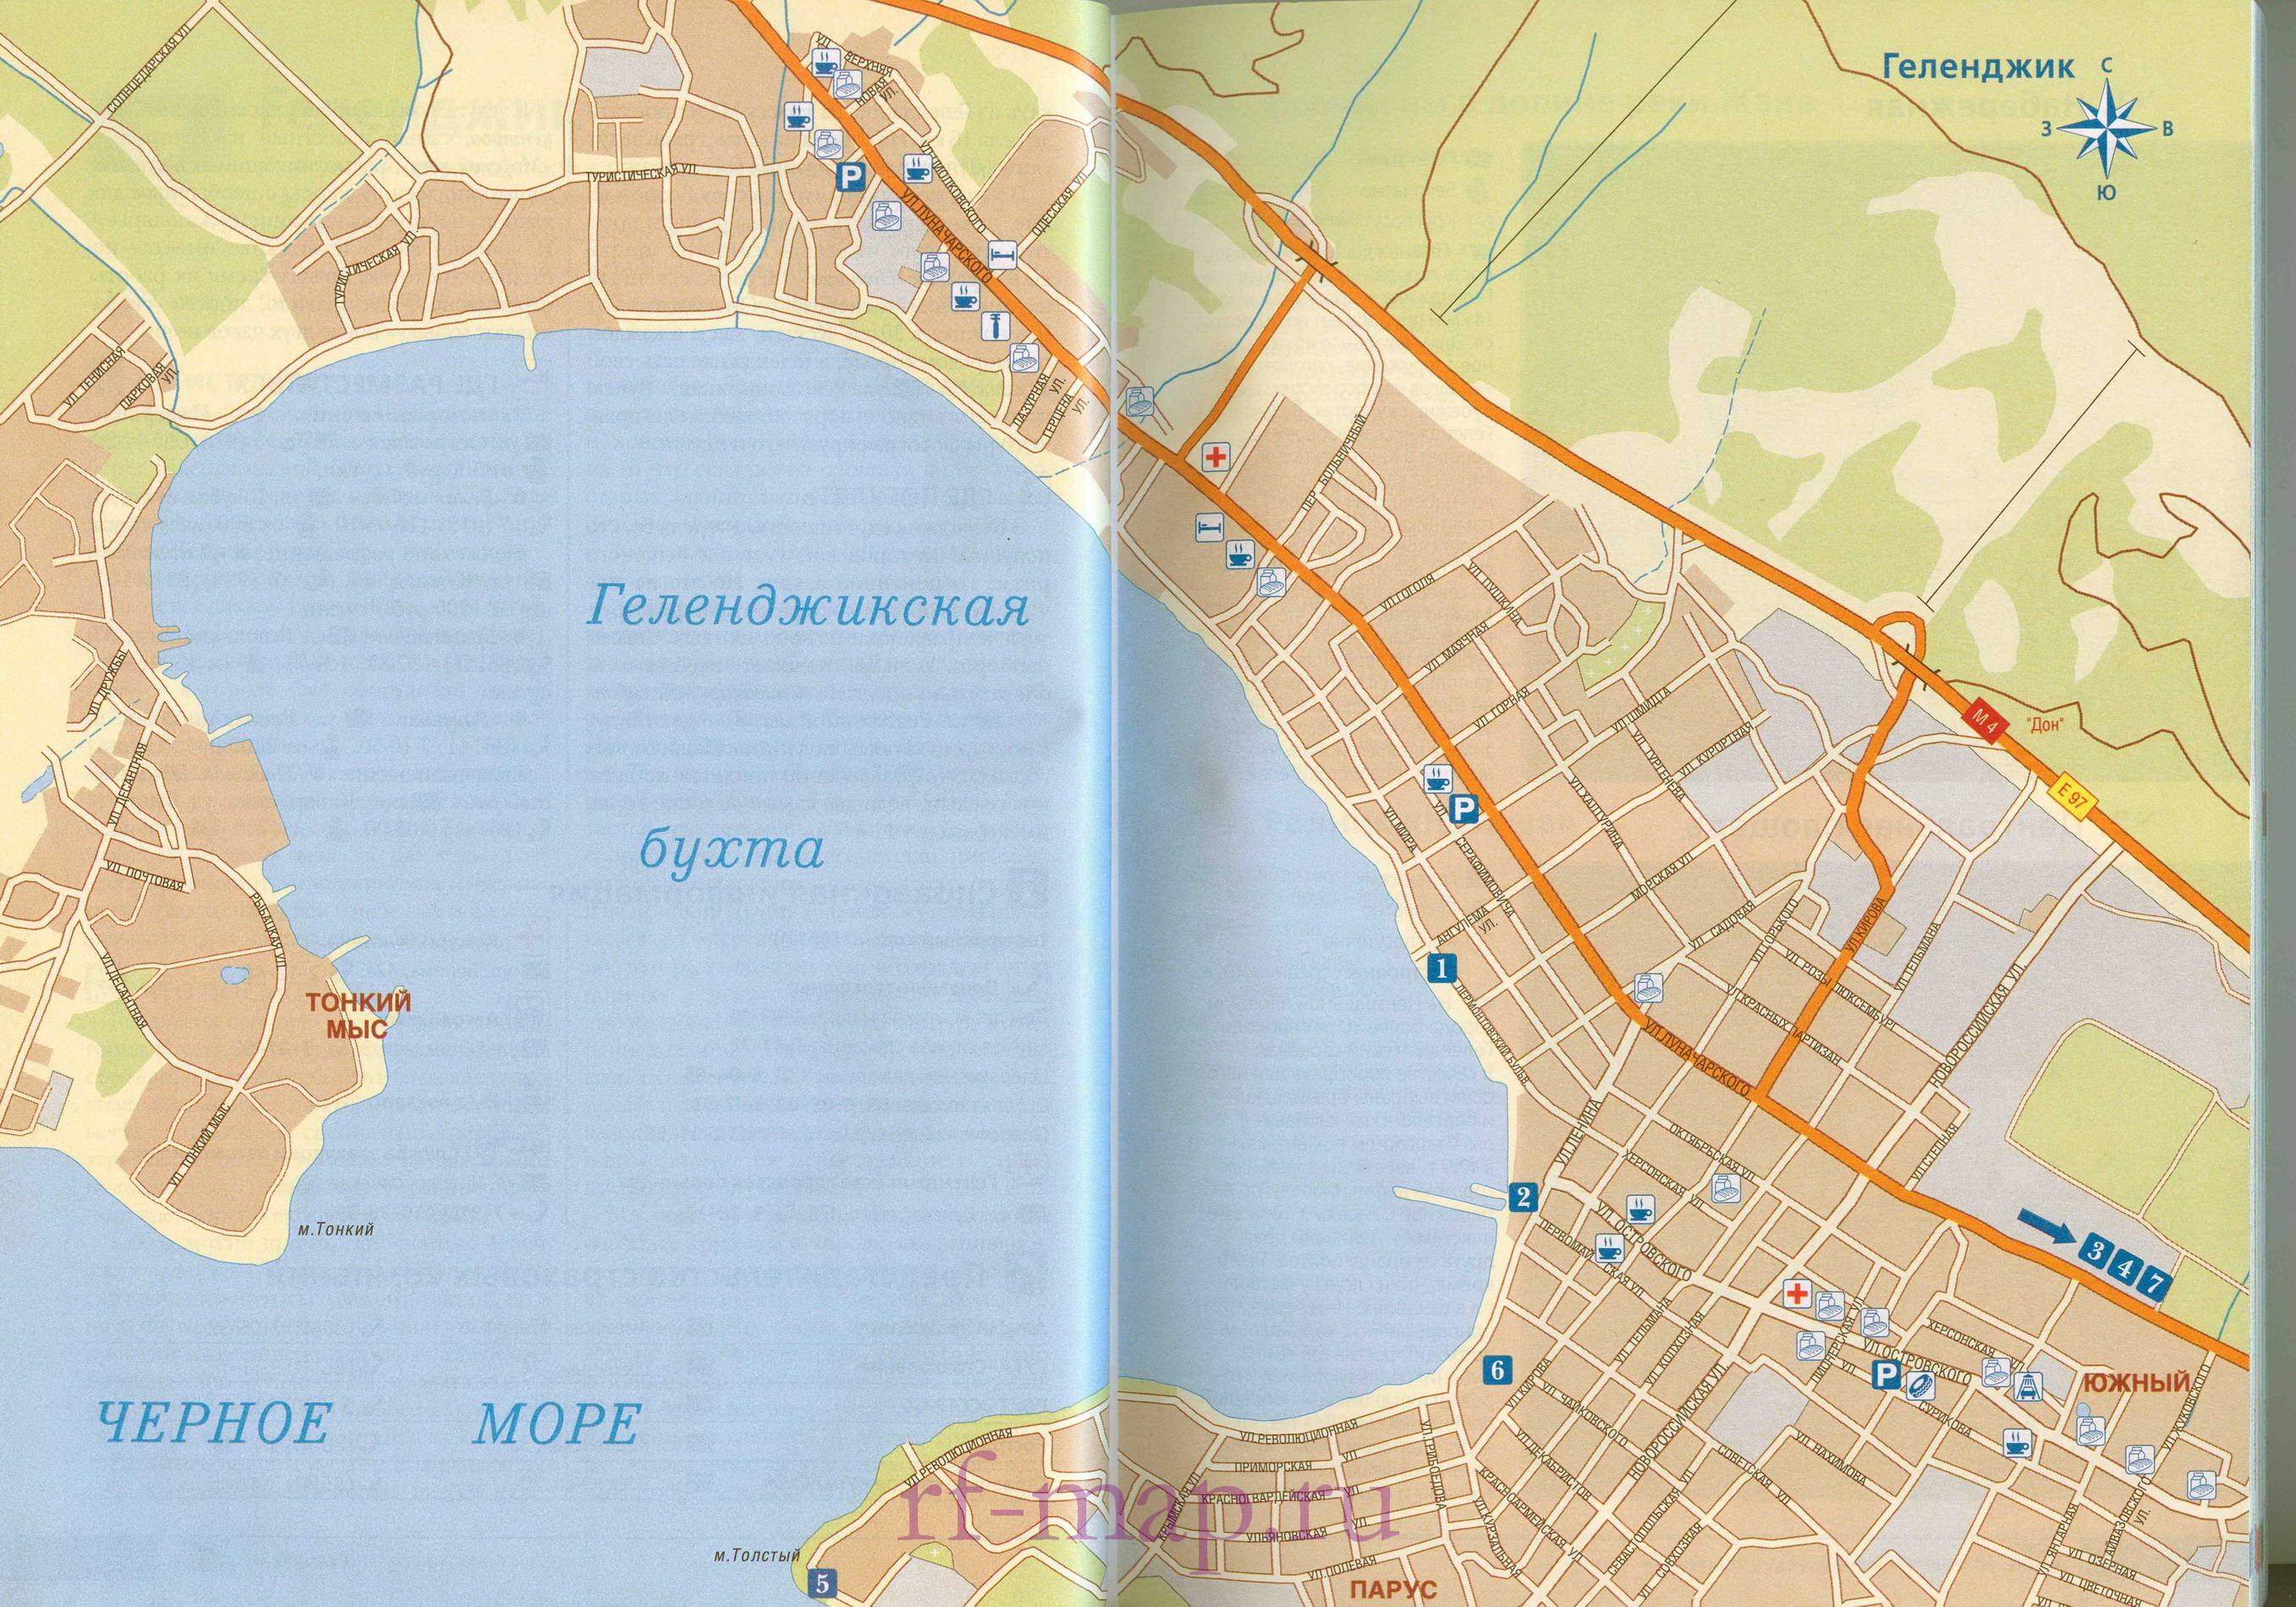 Карта города Геленджик. Подробная карти Геленджика с ...: http://rf-map.ru/map1333924_0_0.htm